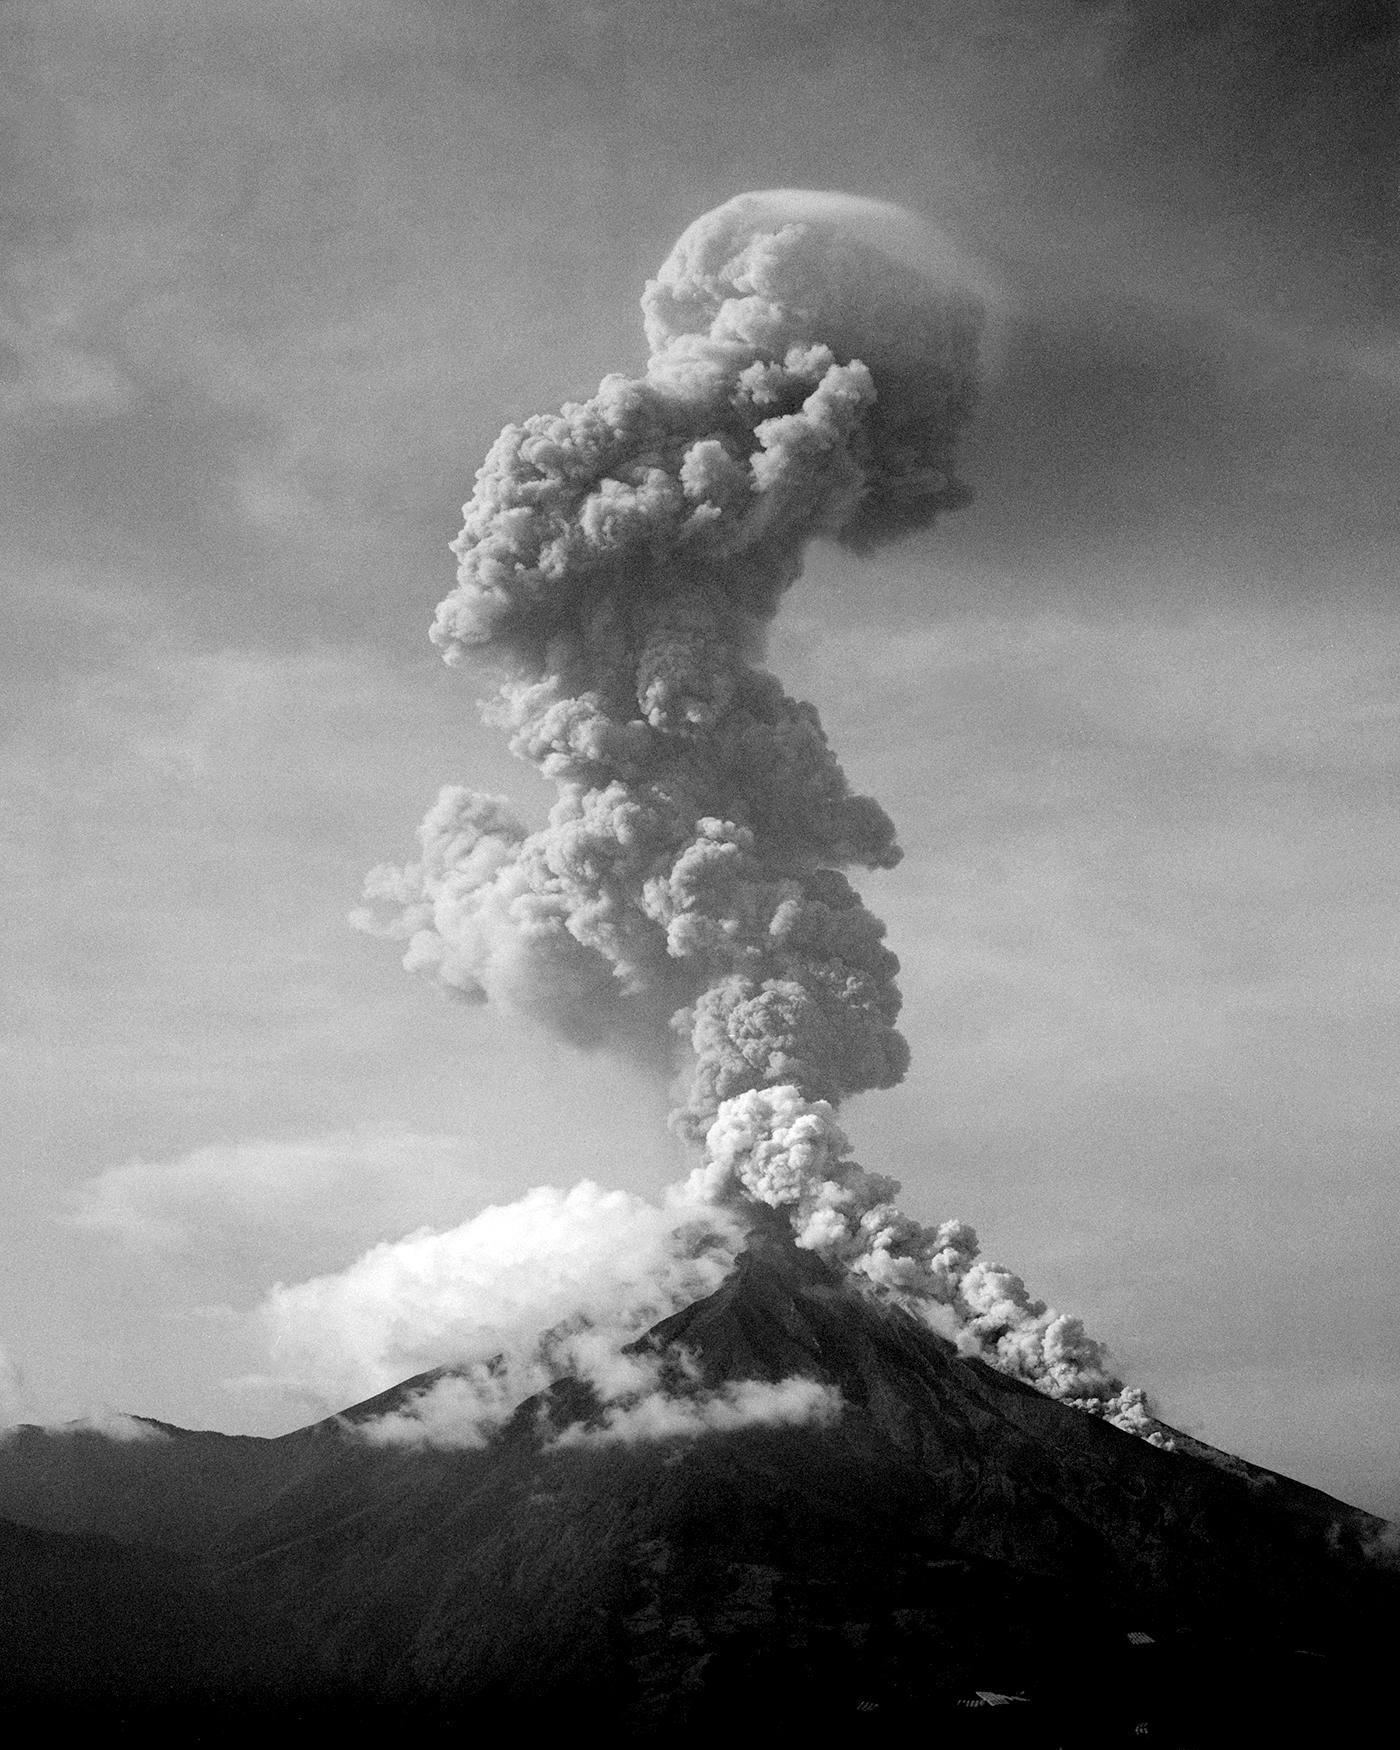 Tungurahua_002.jpg